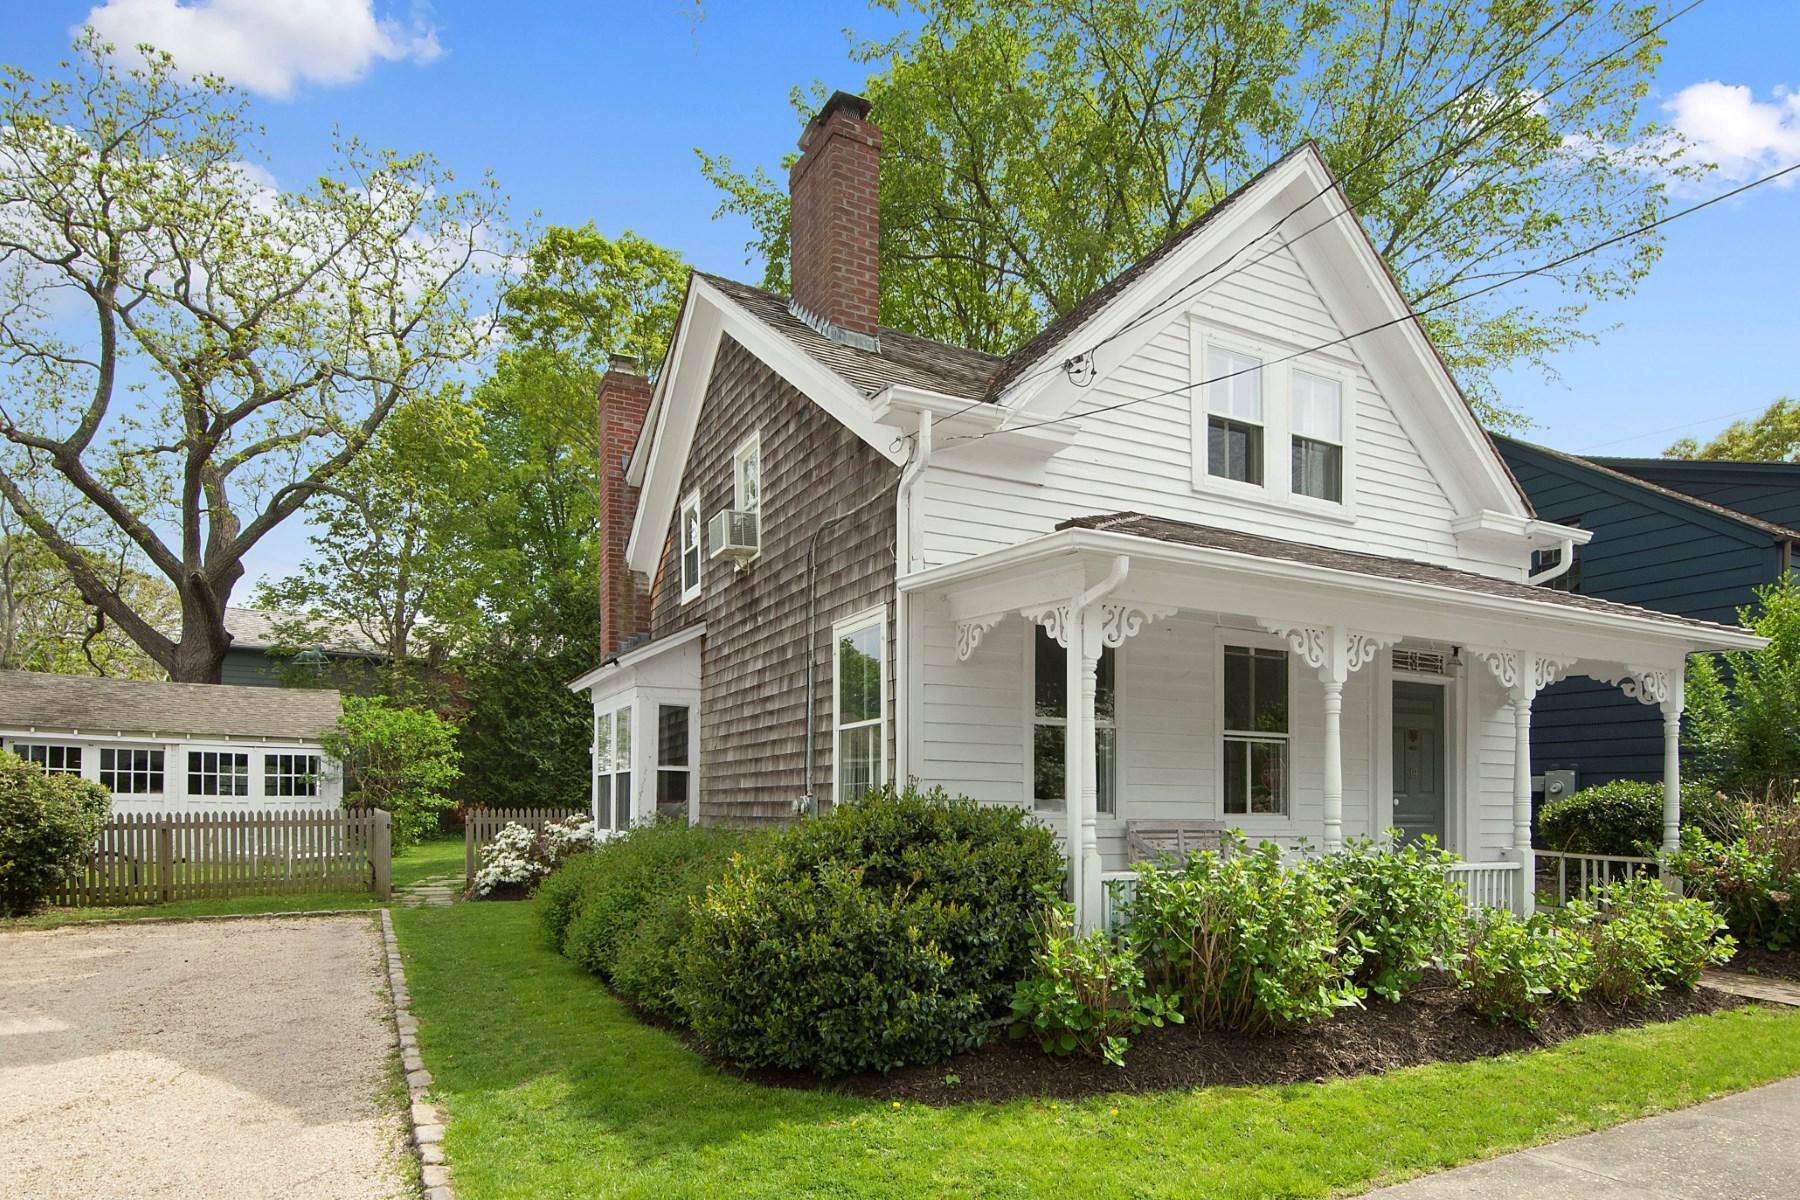 Moradia para Venda às Concord Street Classic Sag Harbor Village, Sag Harbor, Nova York 11963 Estados Unidos